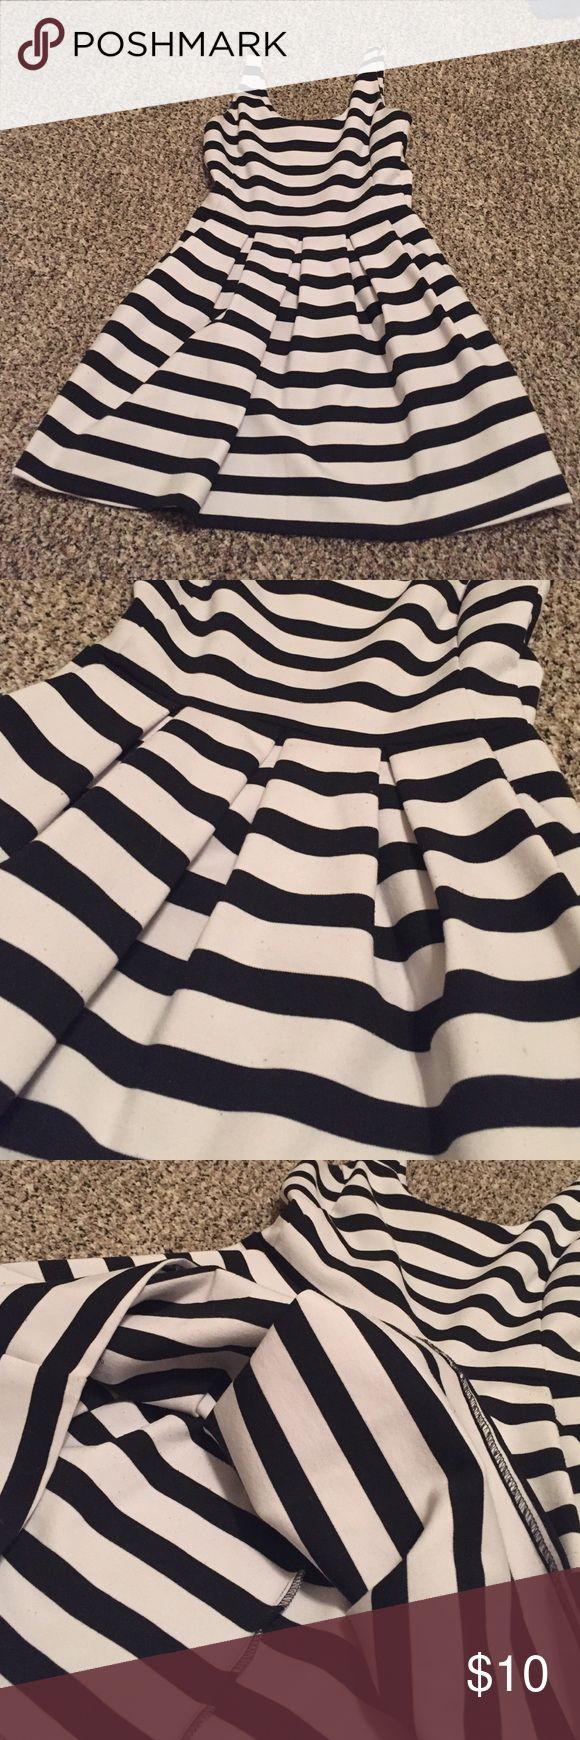 Aeropostale Bethany Mota Dress Bethany Mota for Aeropostale sundress. Black and white stripe zipper back. Size S. Has some piling. Between a mini and midi depending on height Bethany Mota Dresses Mini